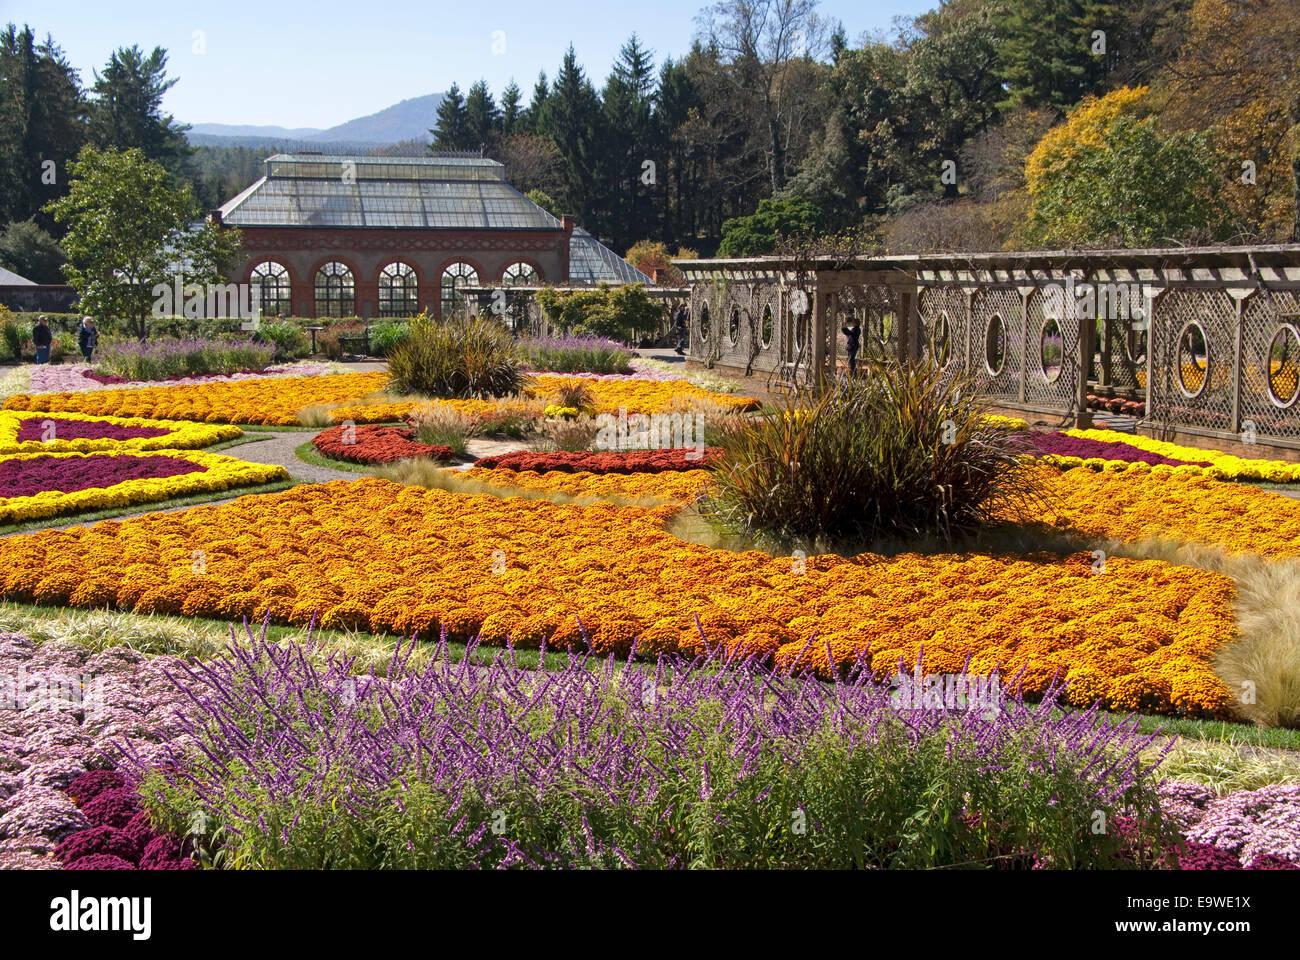 Biltmore Estate gardens in autumn, Asheville, North Carolina. - Stock Image